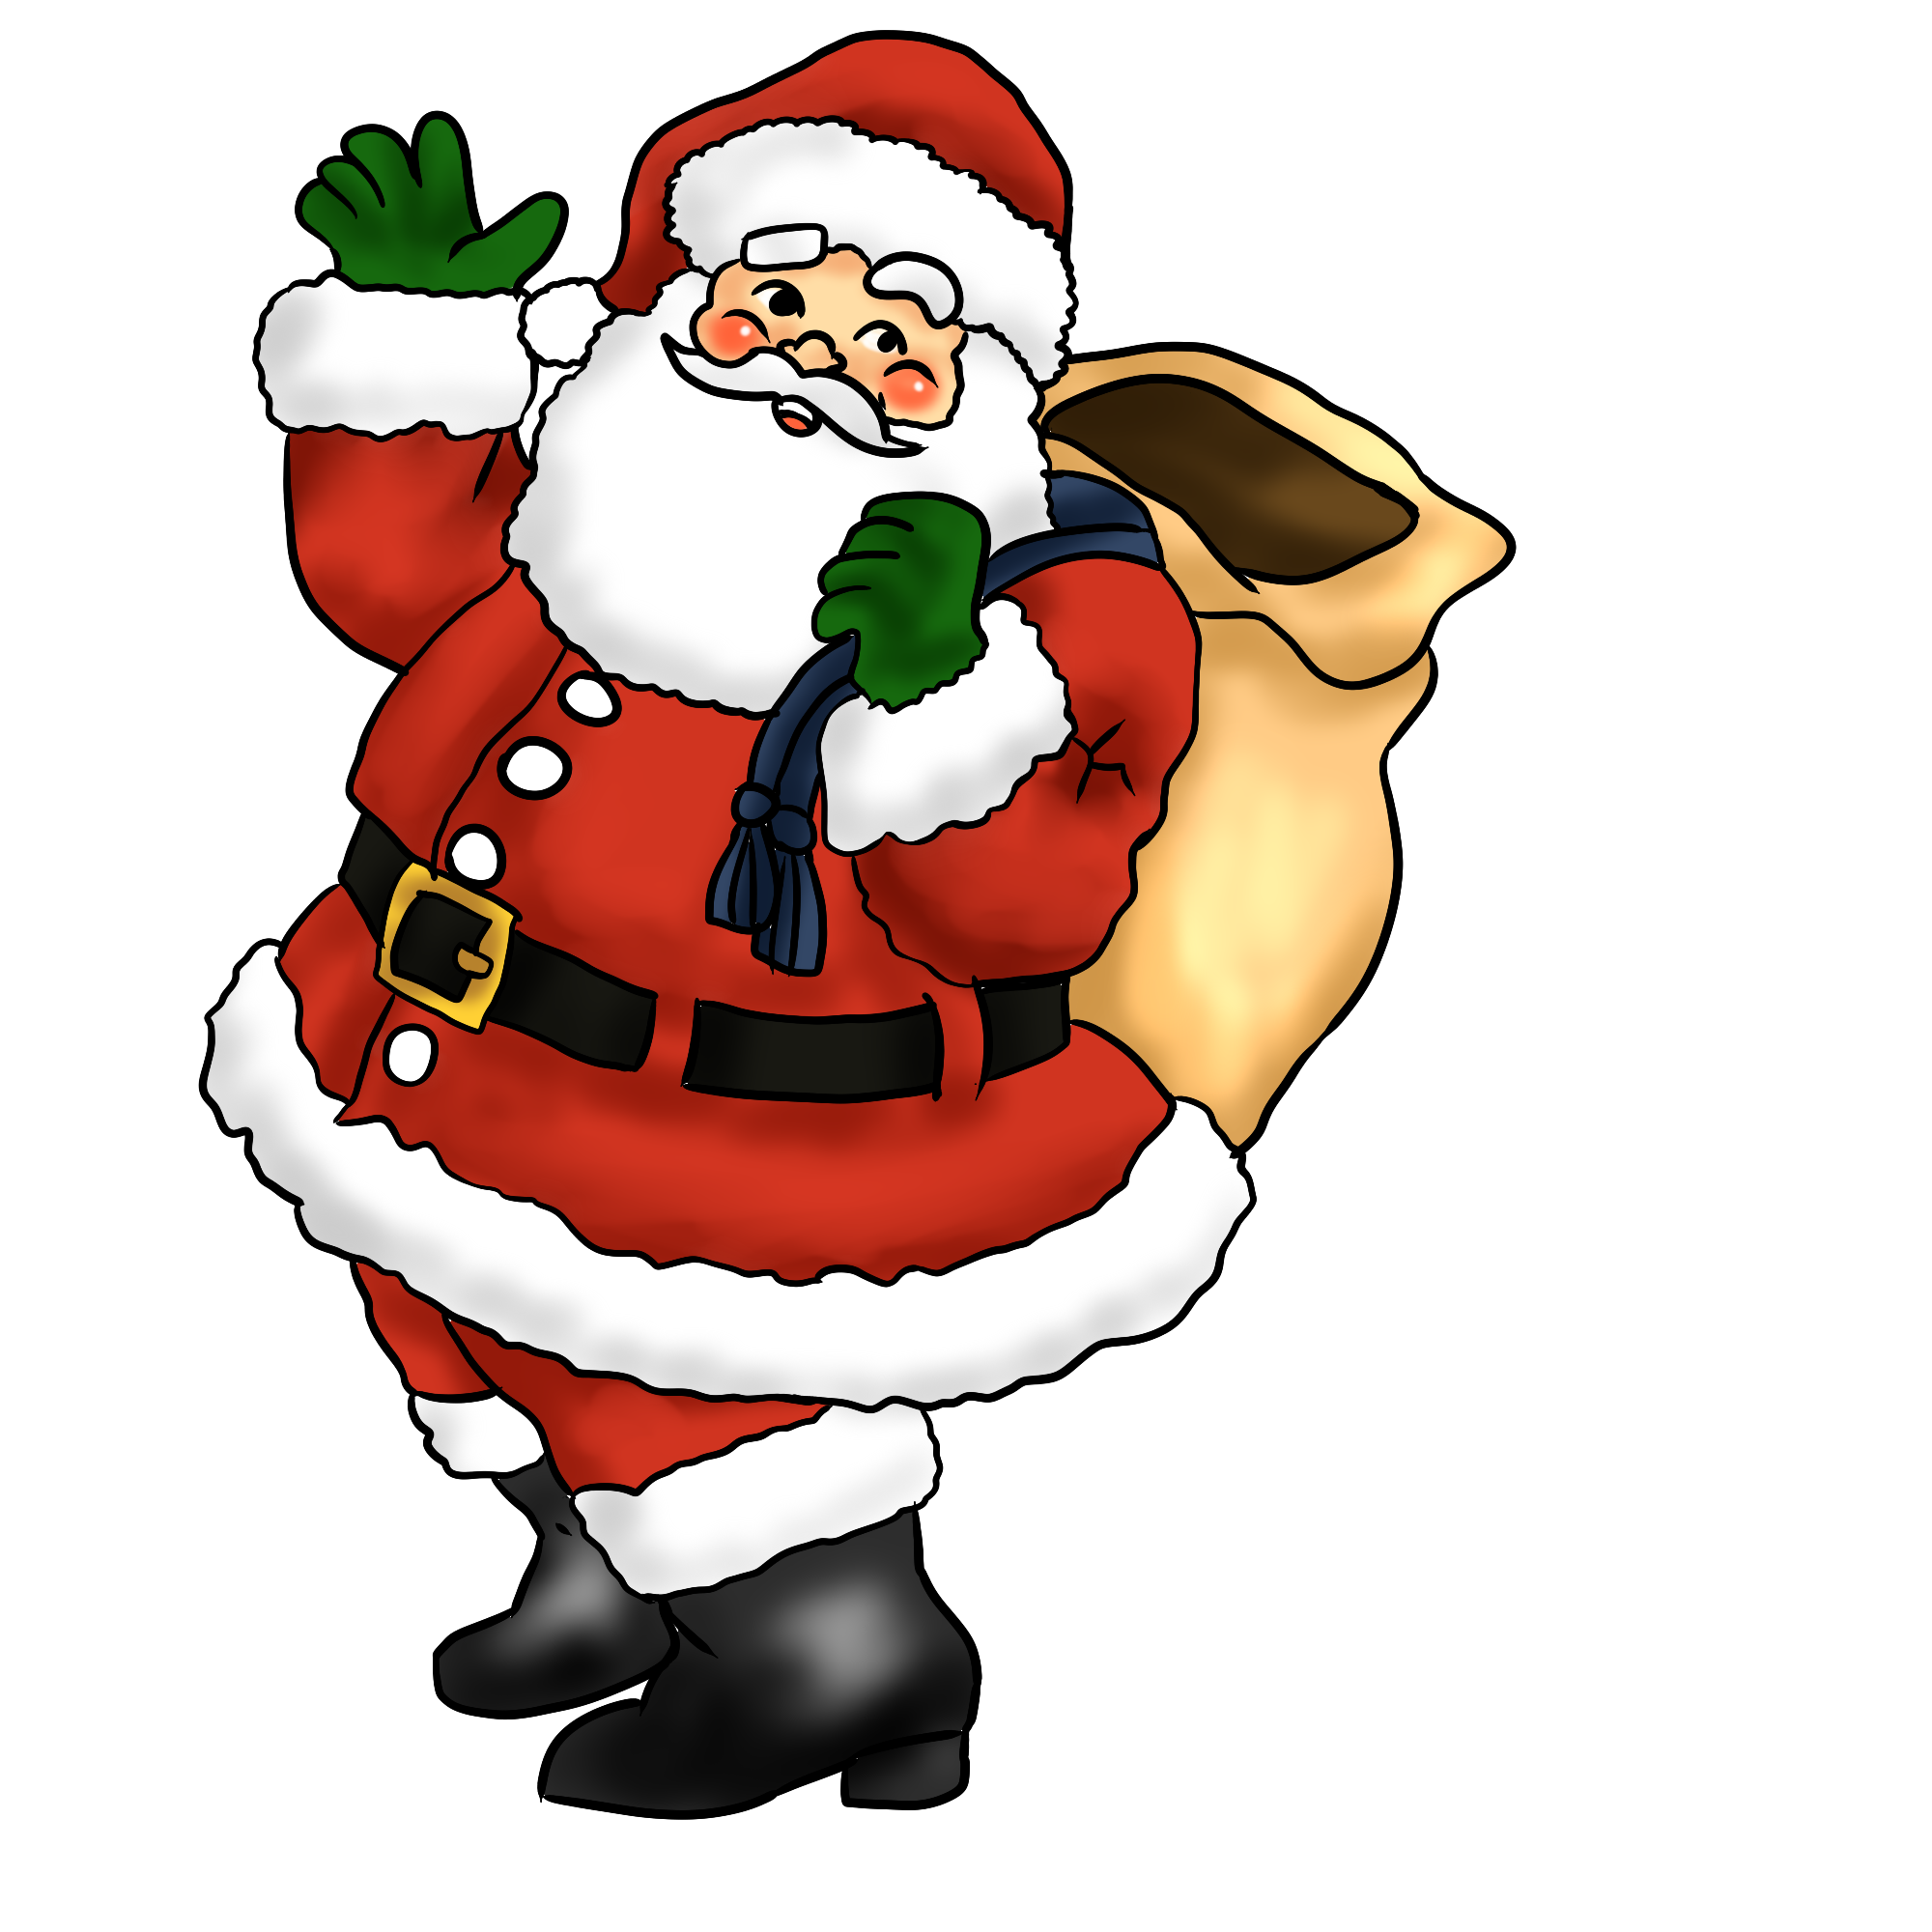 Santa clipart #5